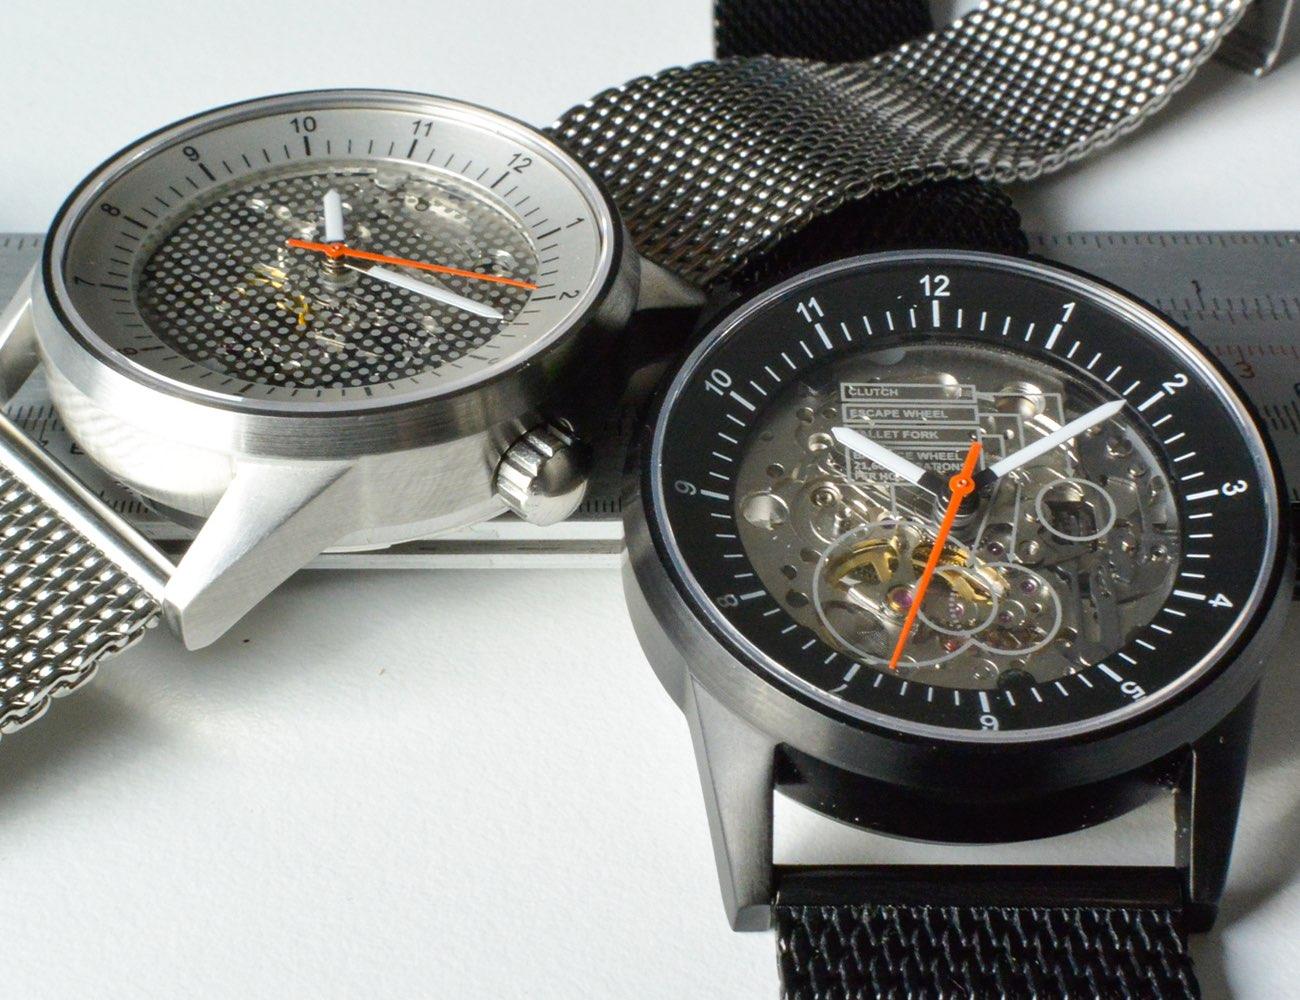 Caliper View Wristwatch